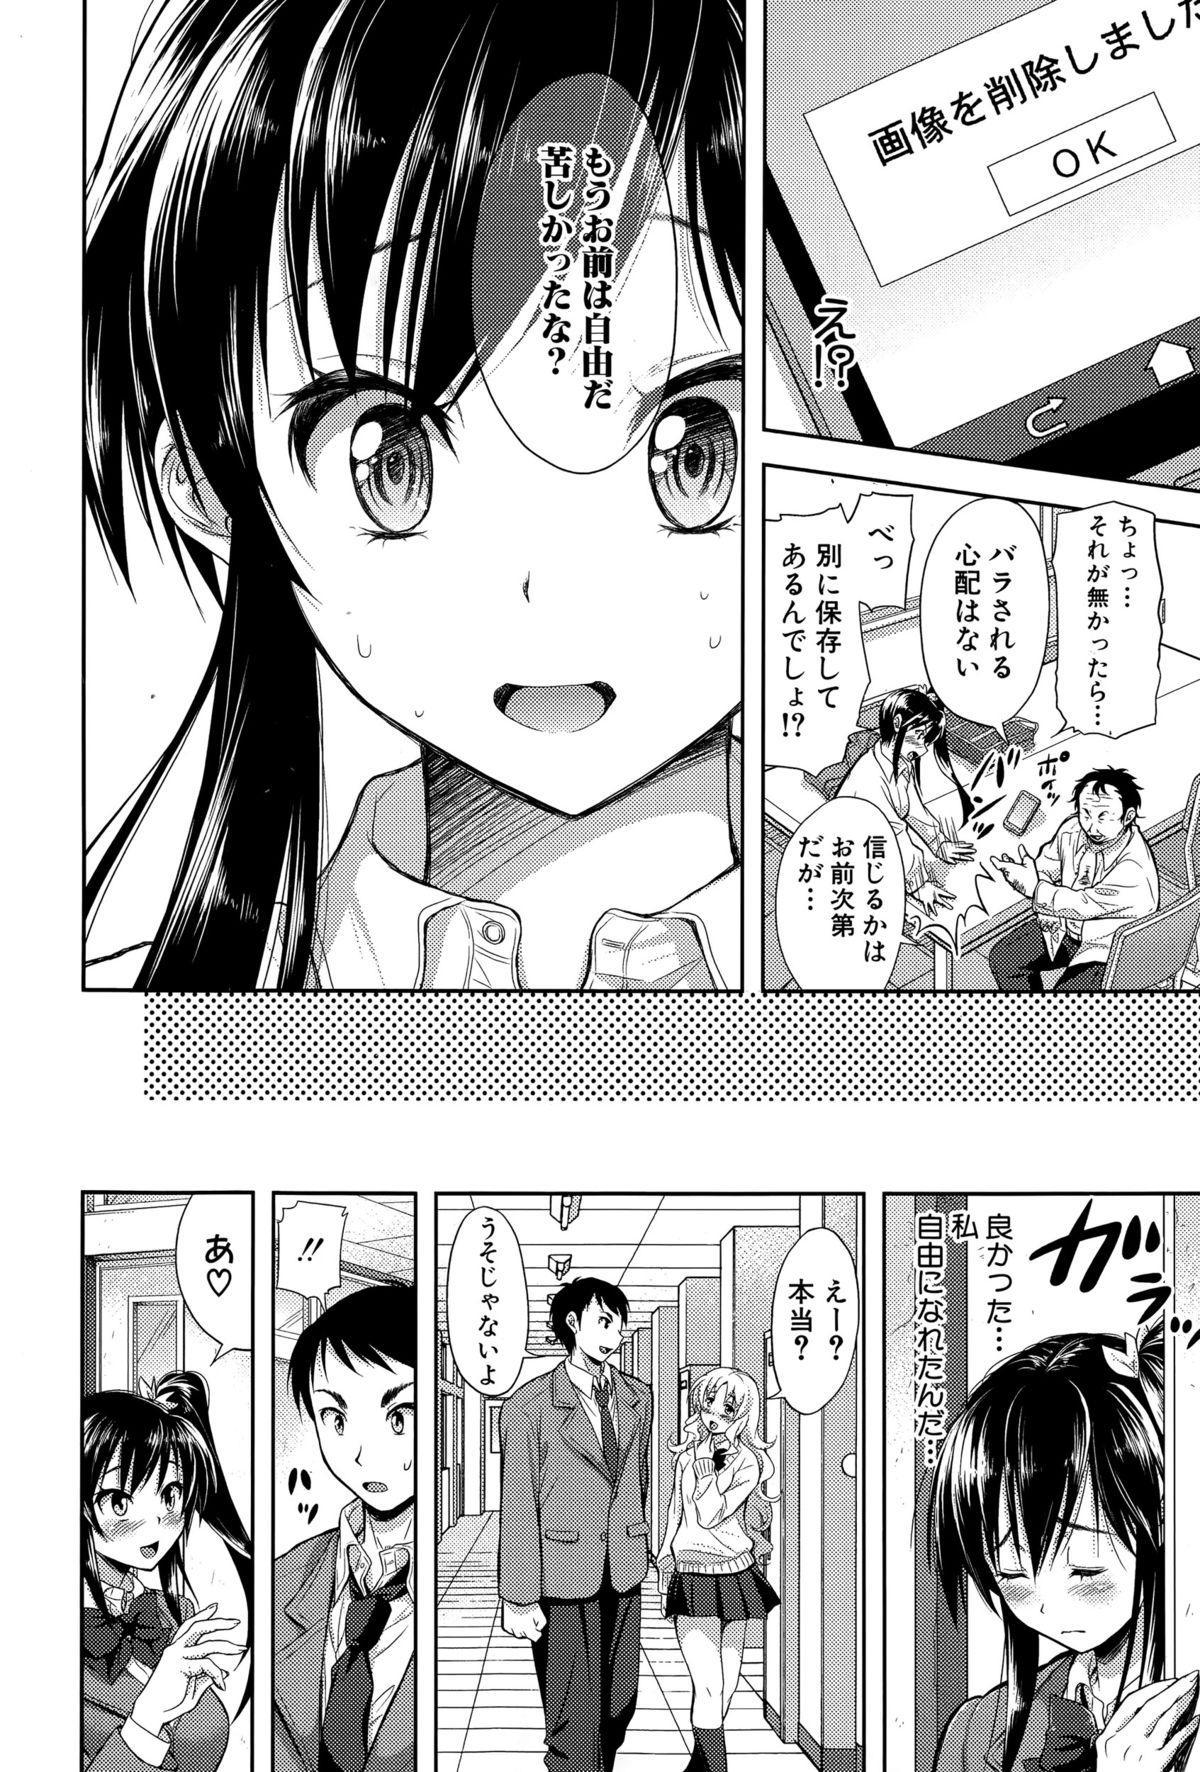 COMIC Shingeki 2015-07 127